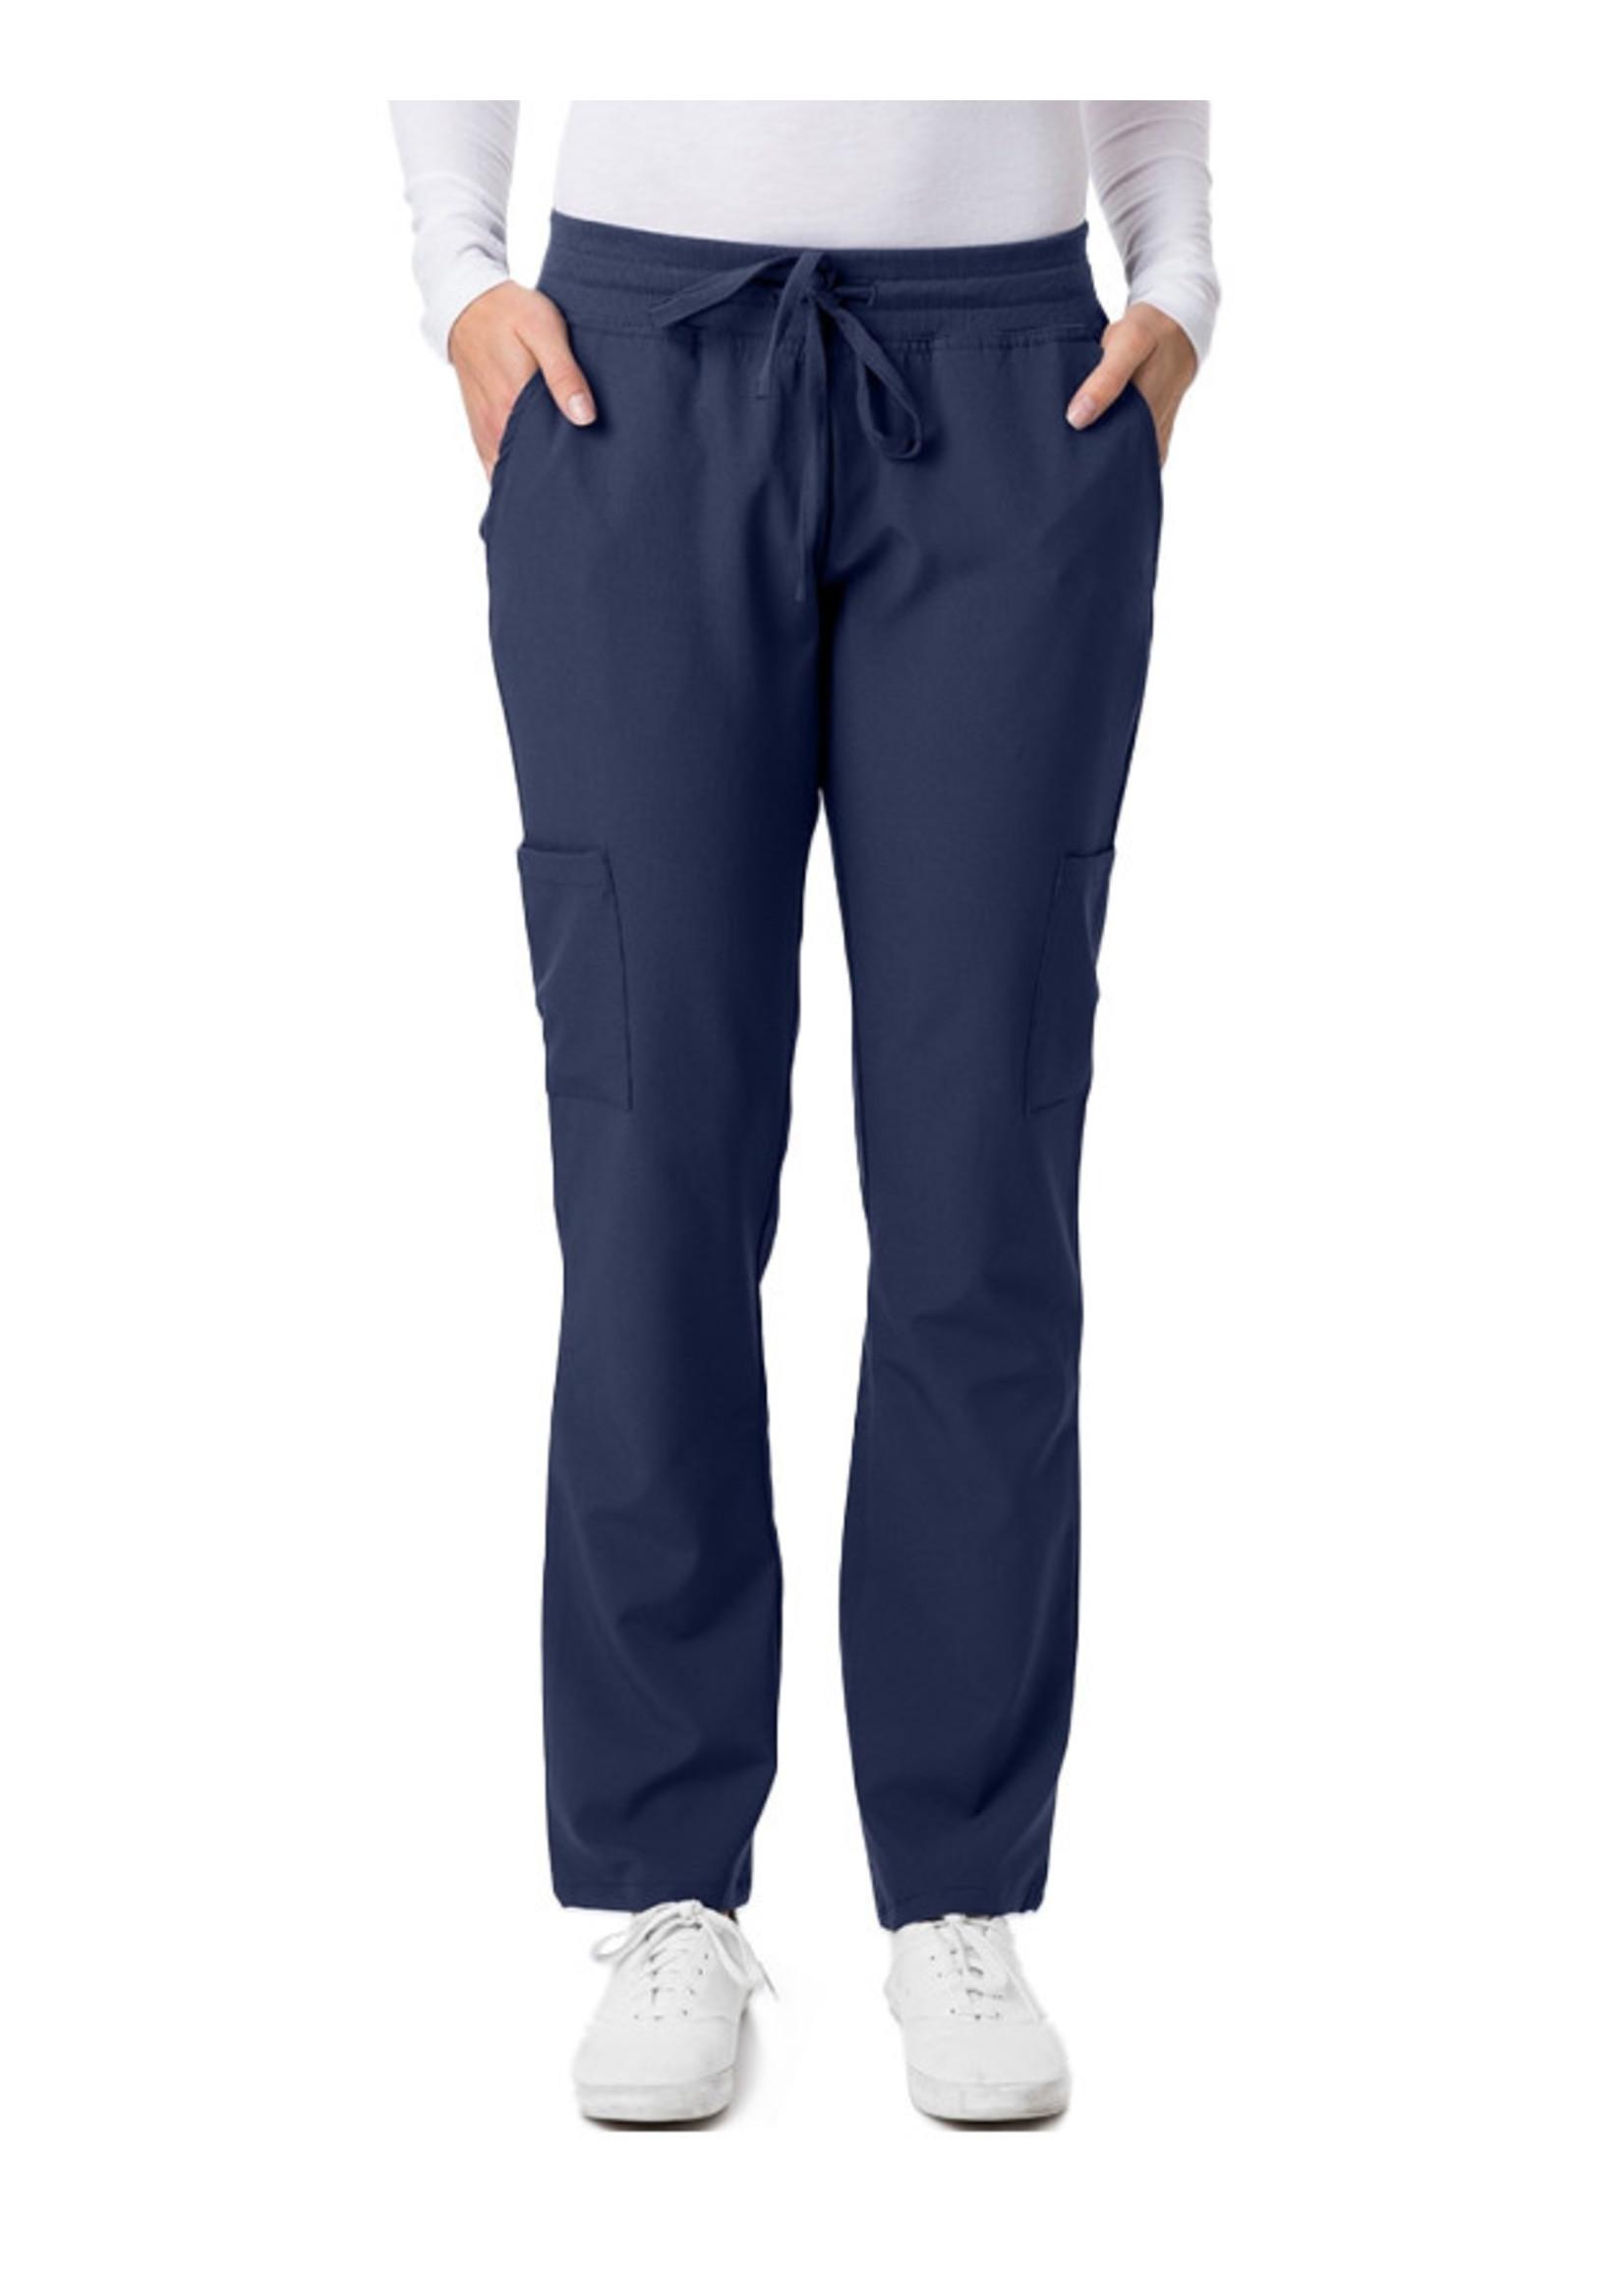 4Flex Pantalon Yoga 4Flex Greentown 2200